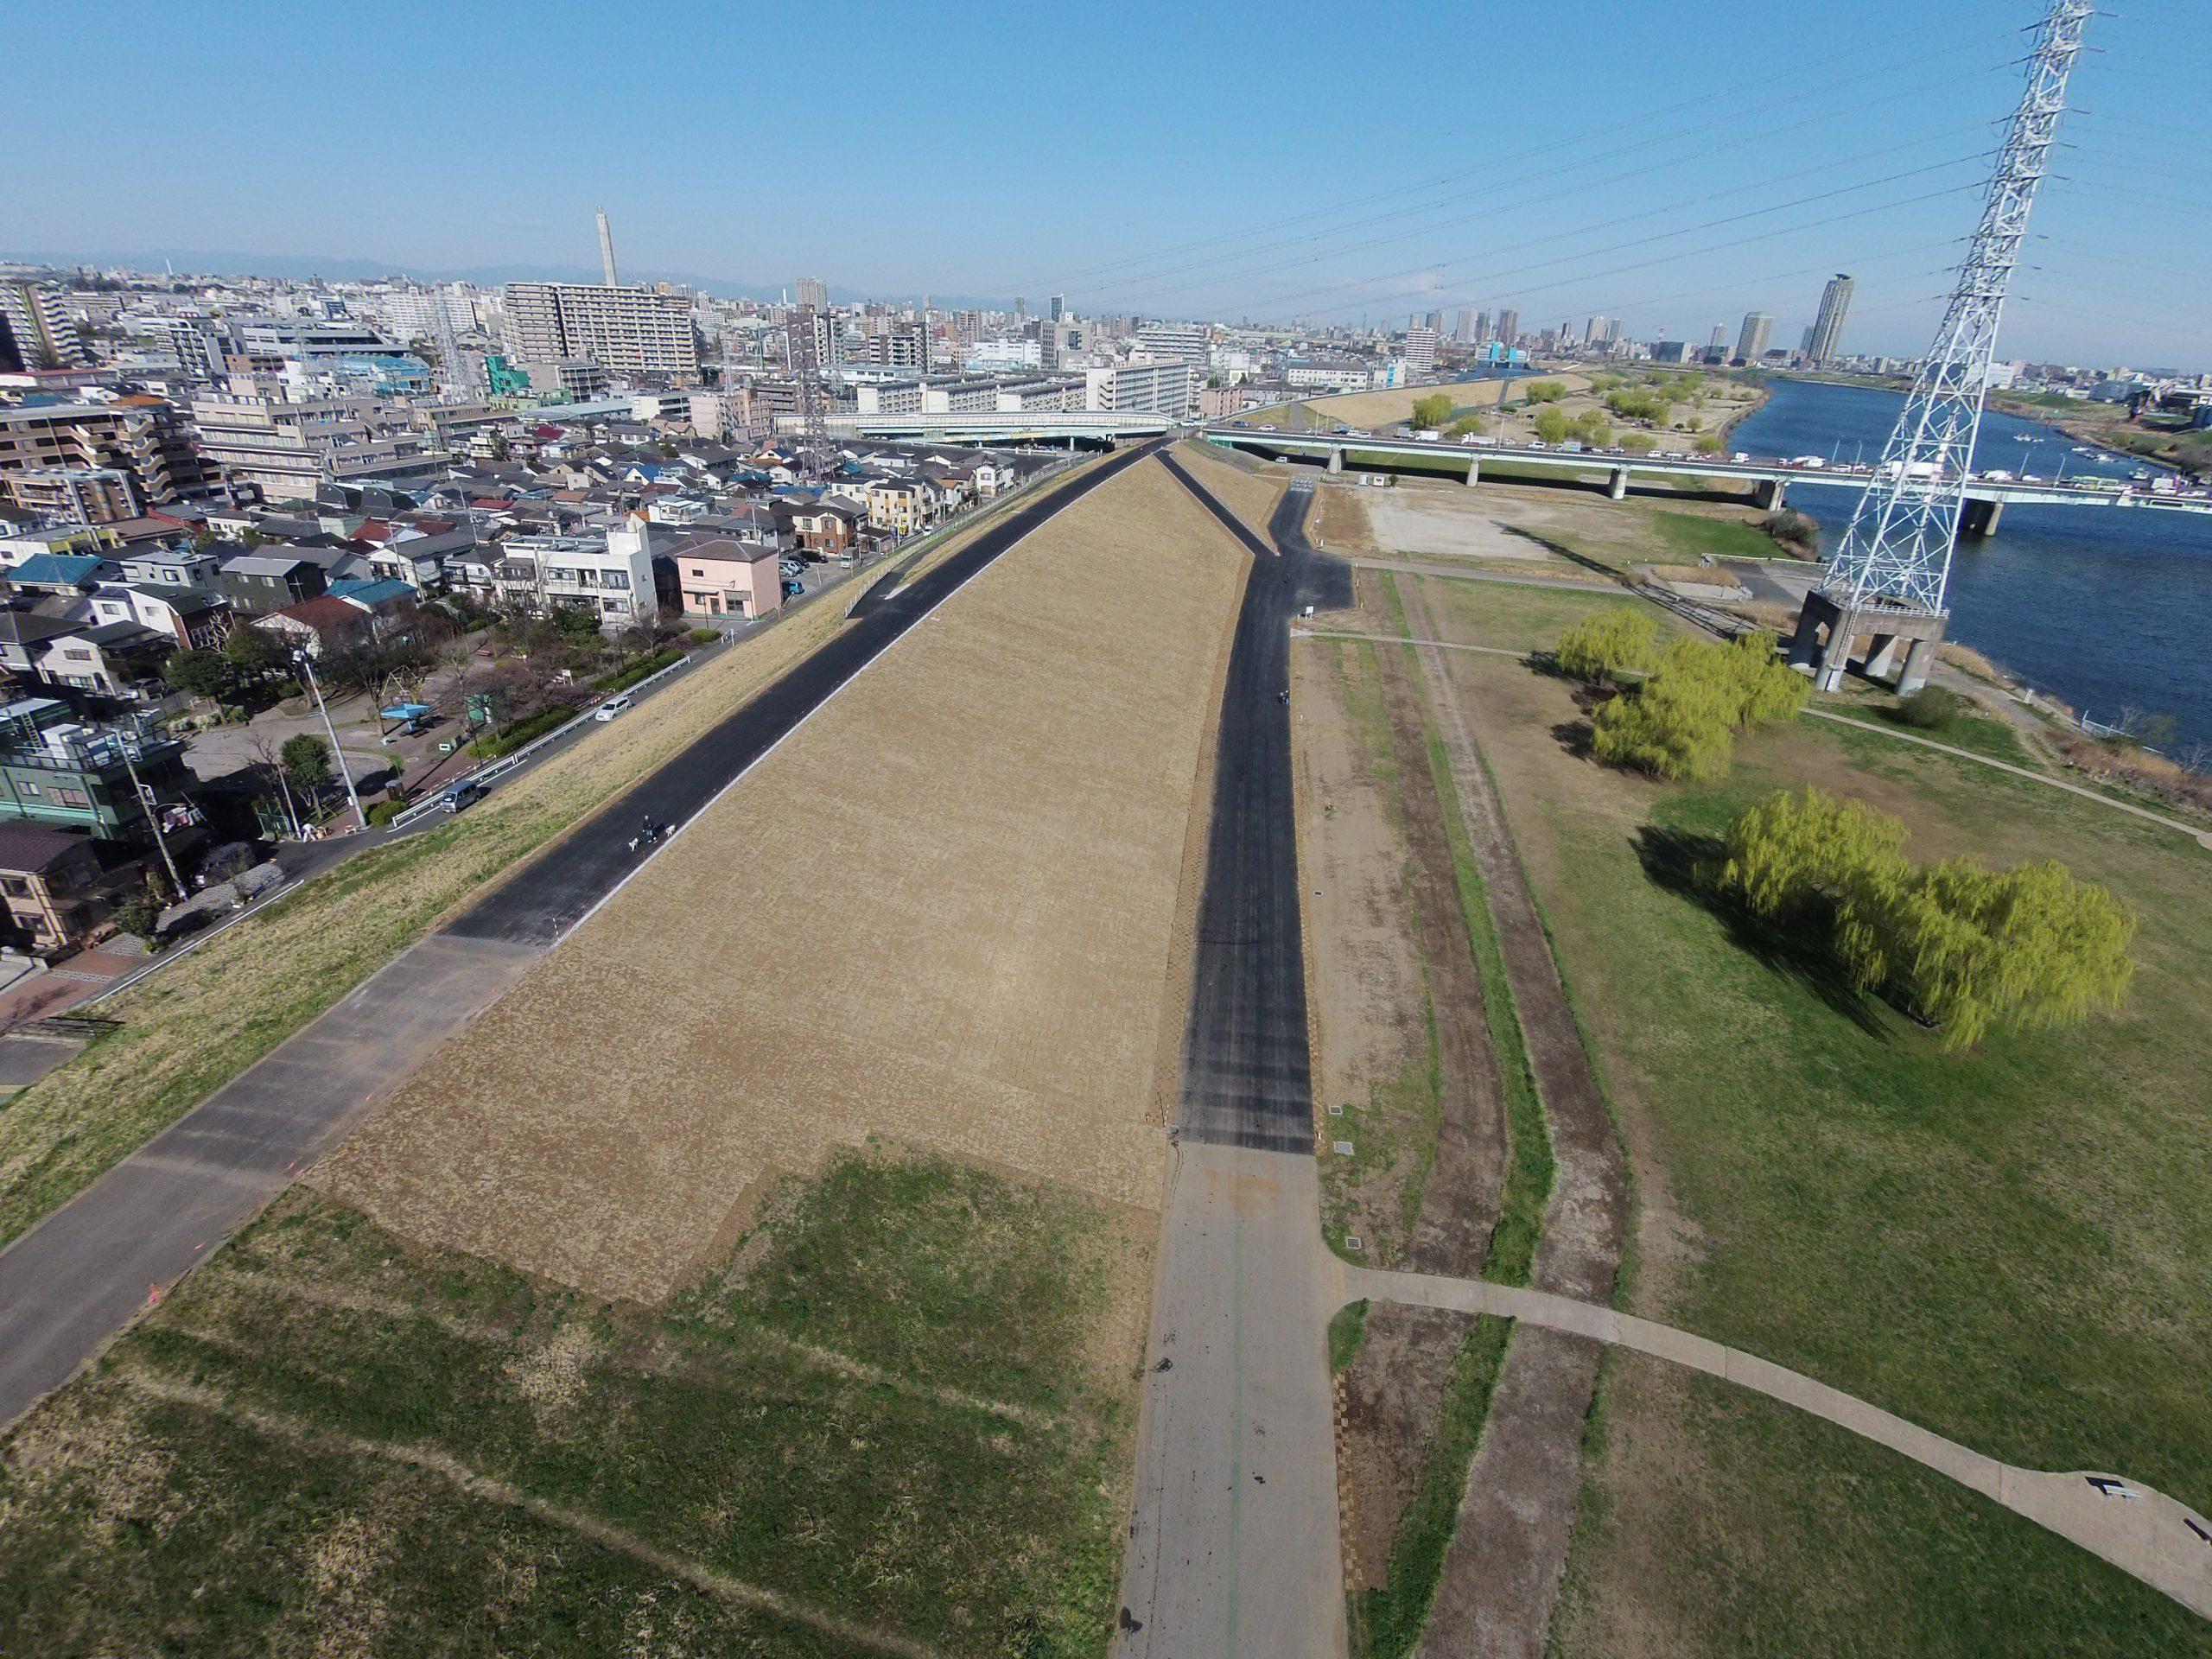 新田二丁目堤防強化対策(H25)工事 イメージ